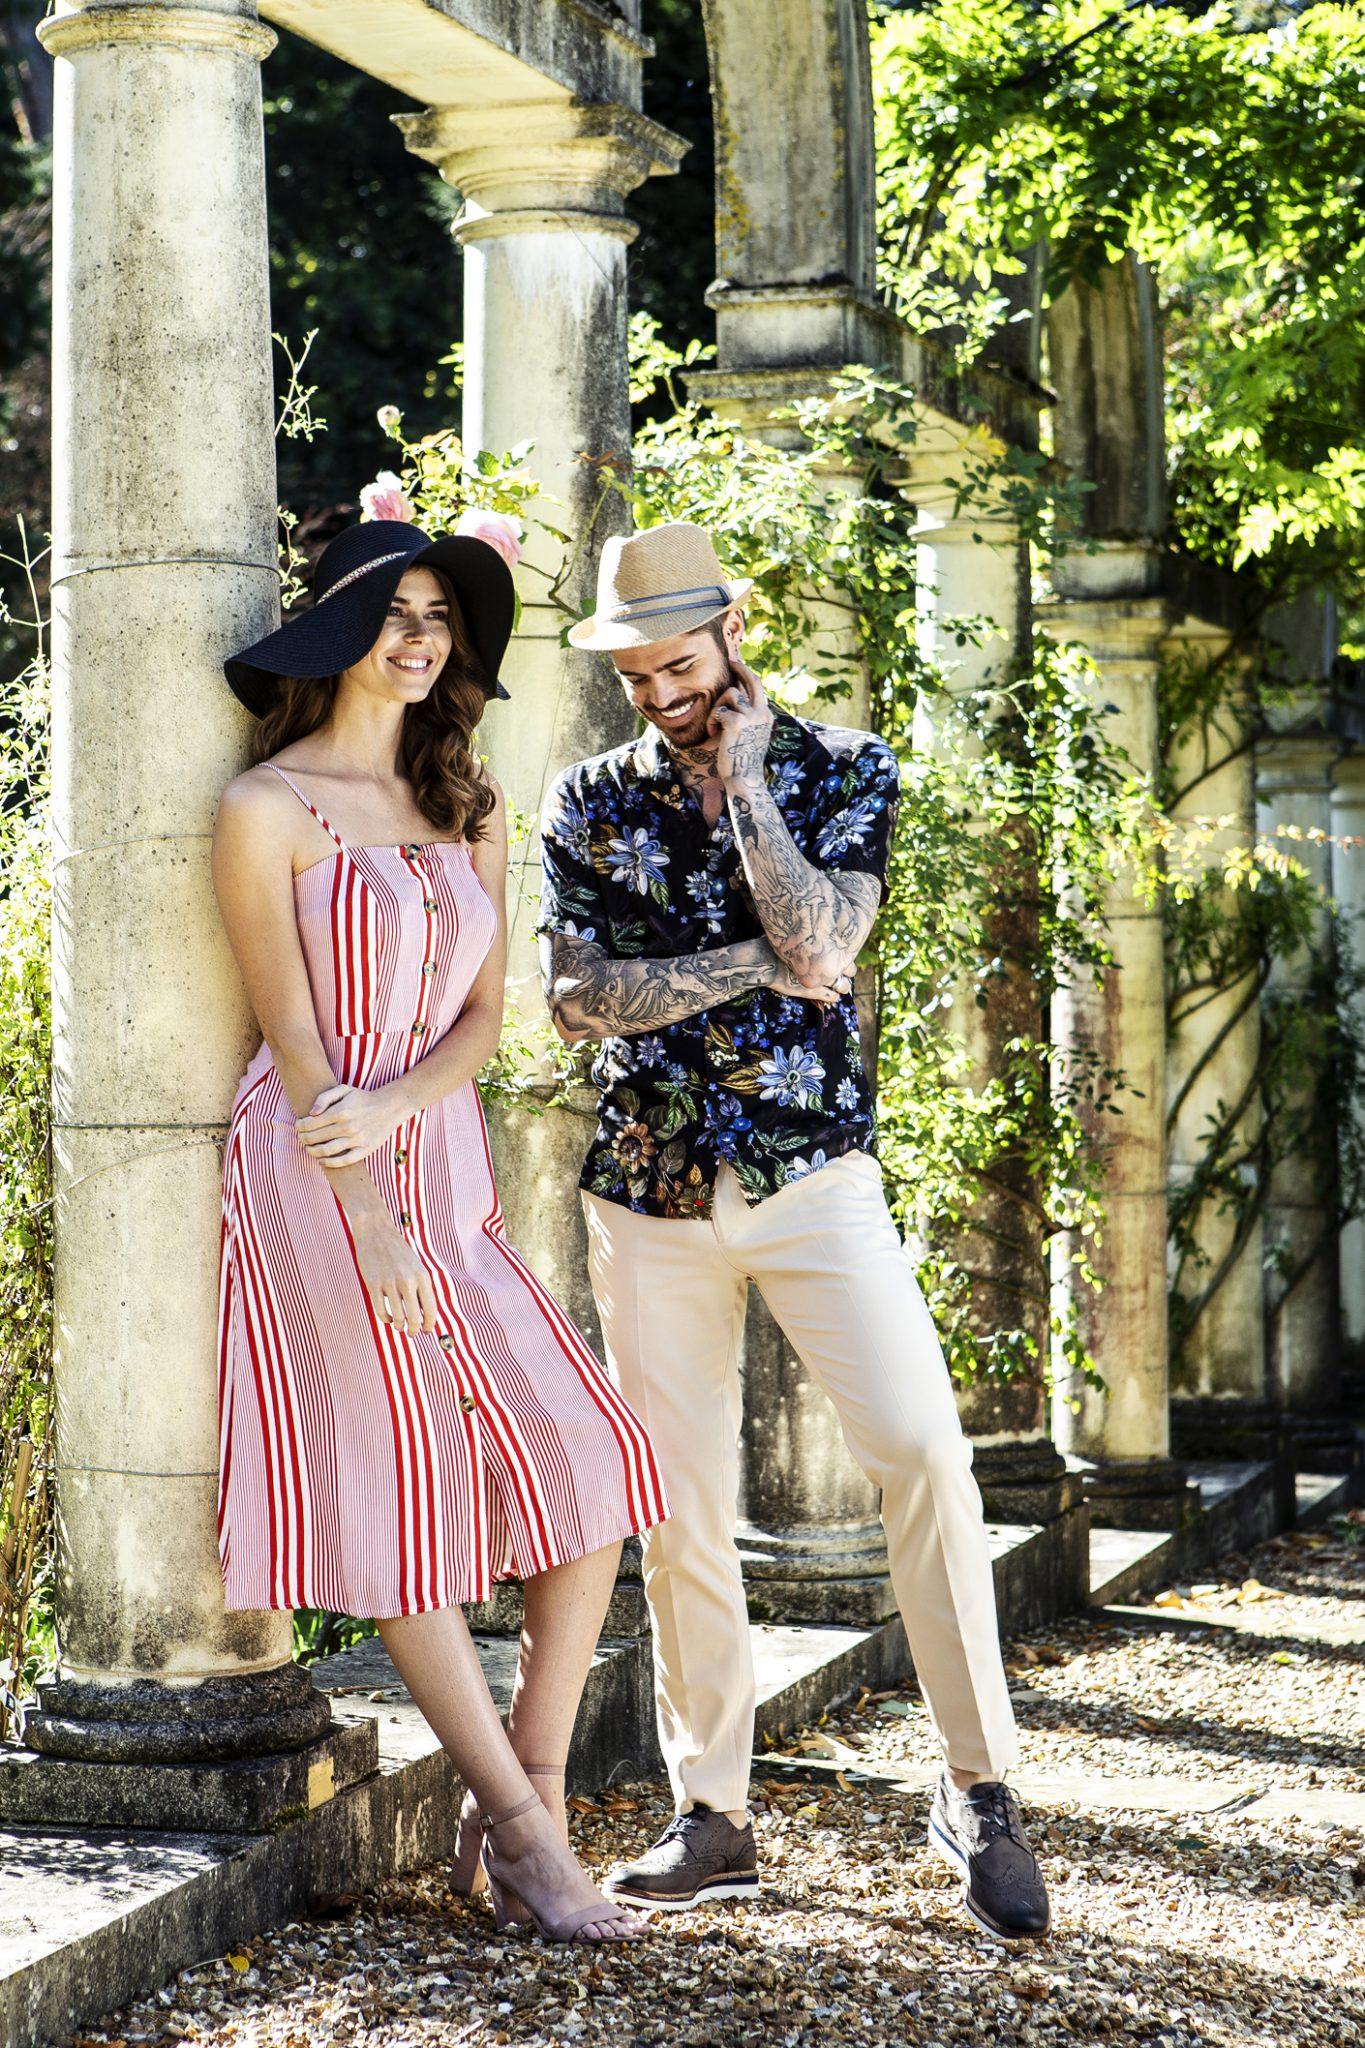 menswear-and-womenswear-fashion-photography-in-manchester